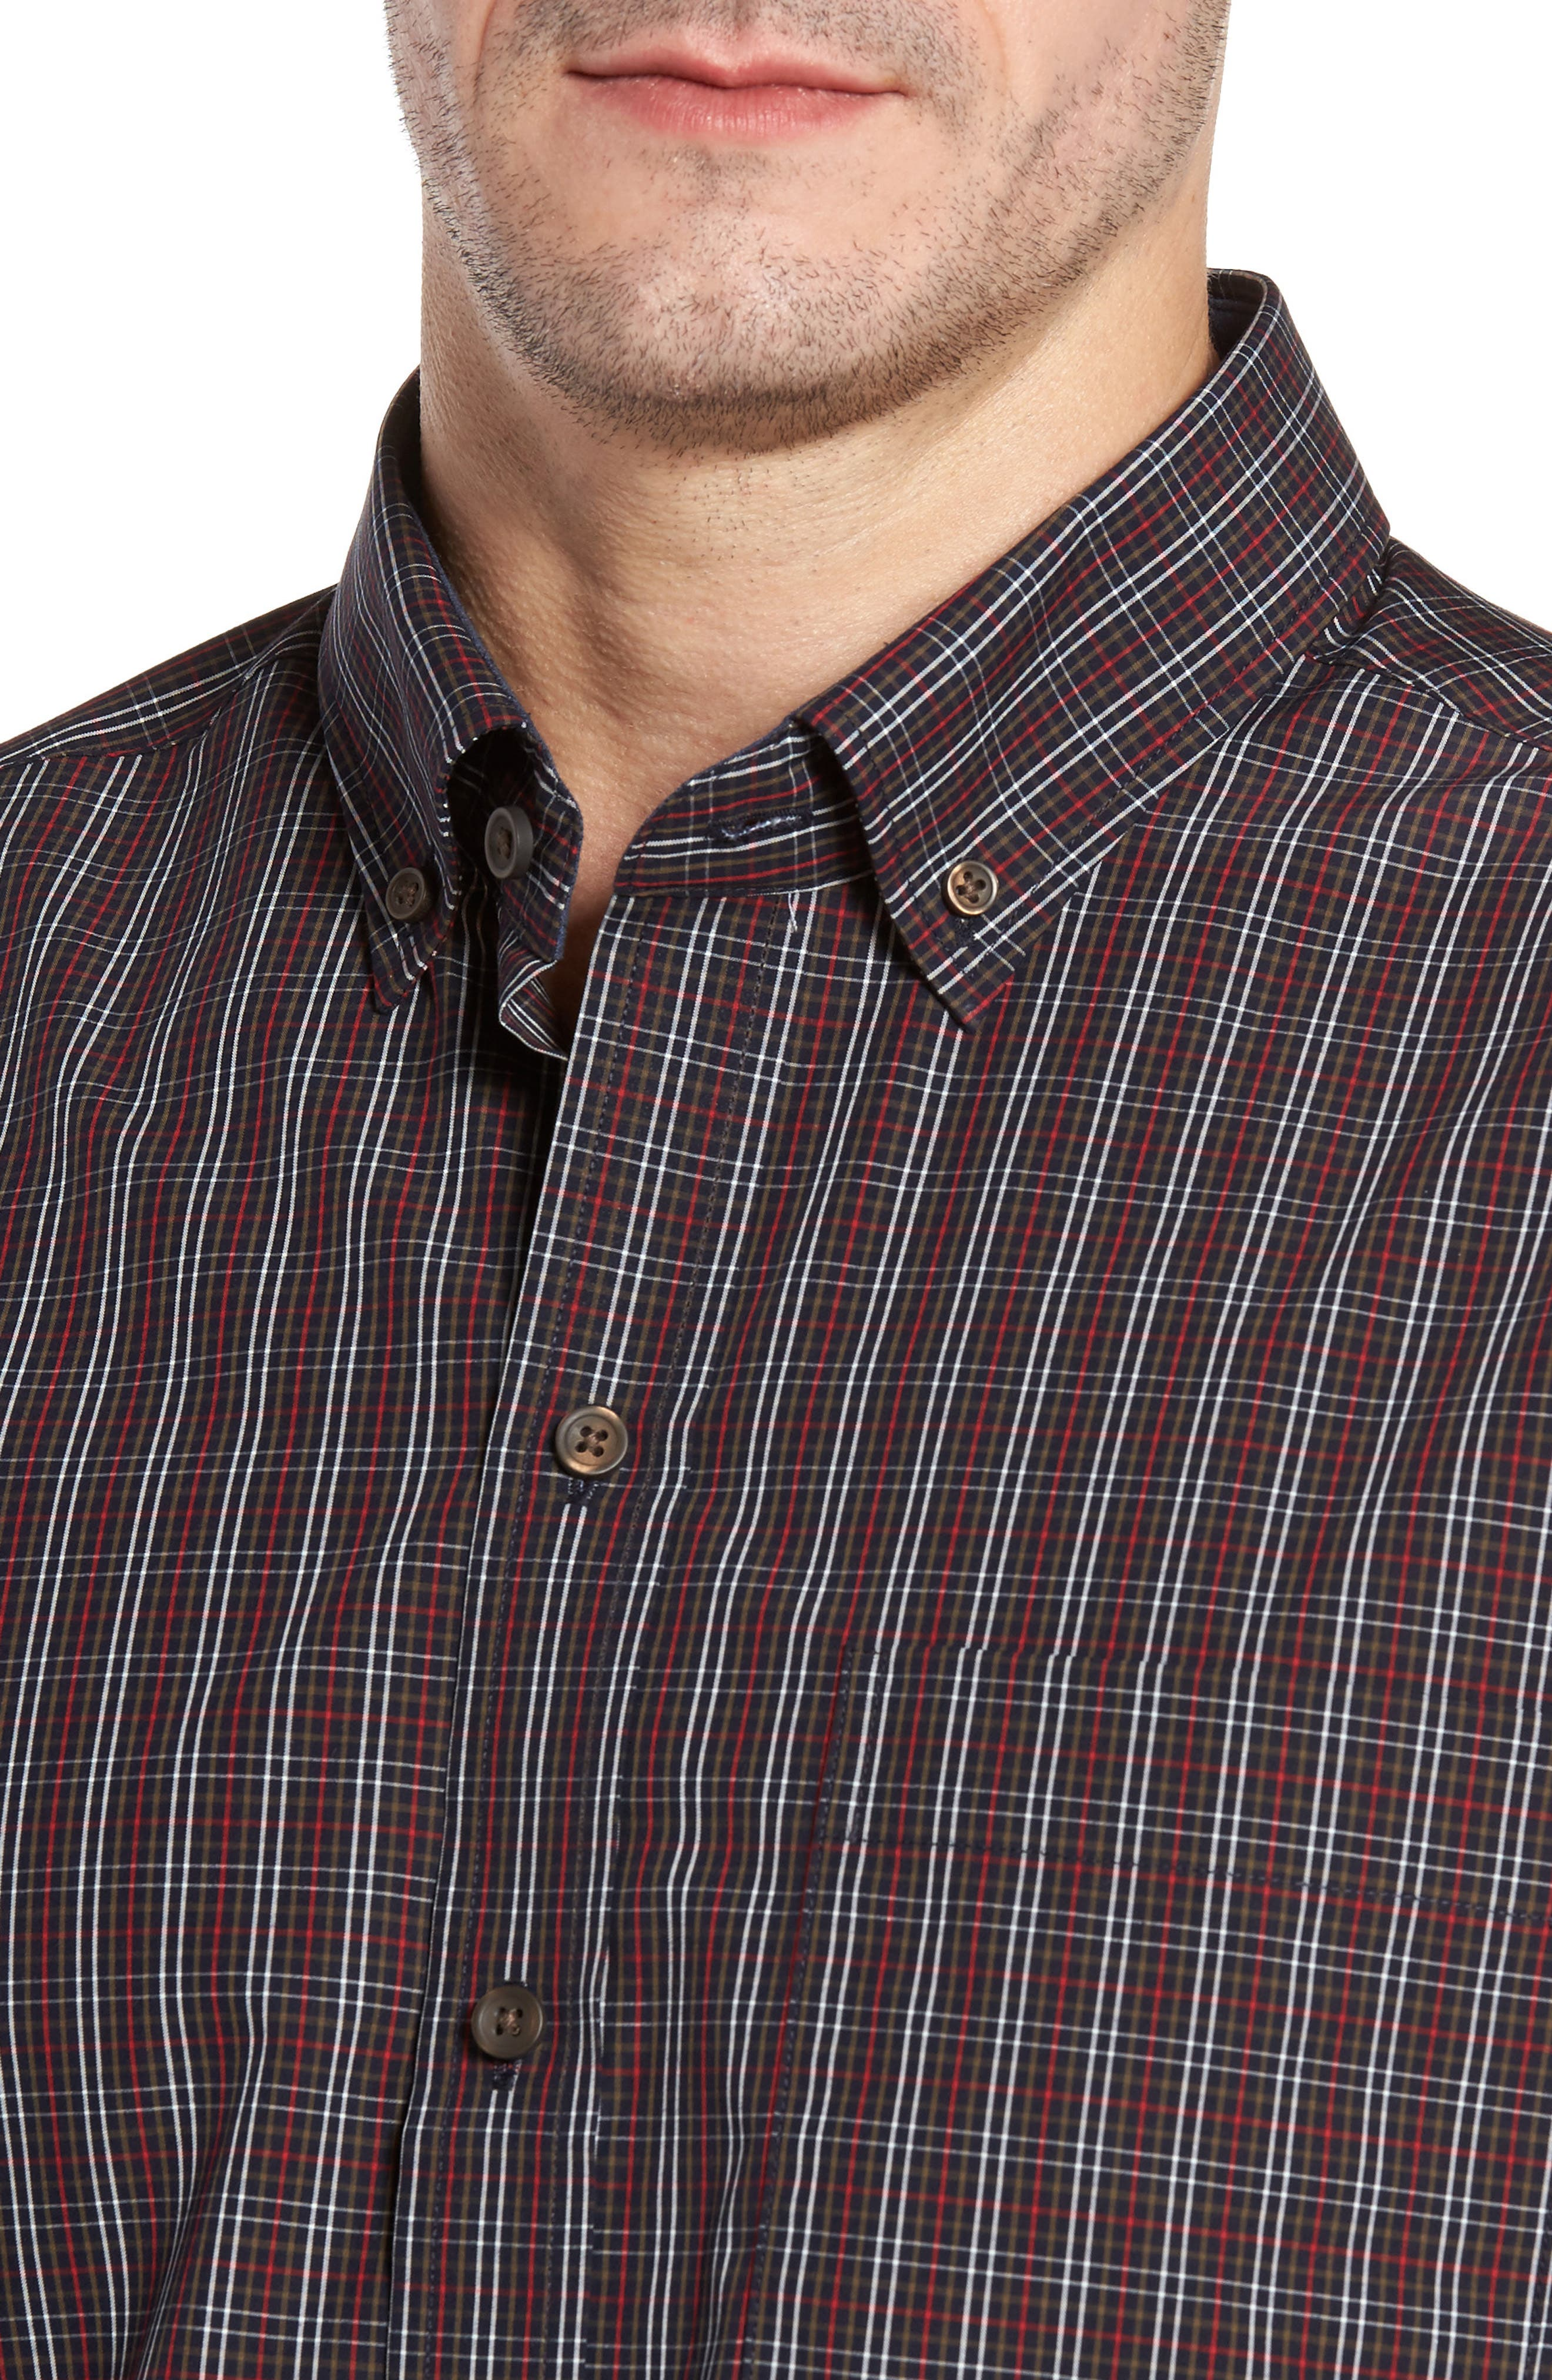 Cavanah Non-Iron Plaid Sport Shirt,                             Alternate thumbnail 4, color,                             493